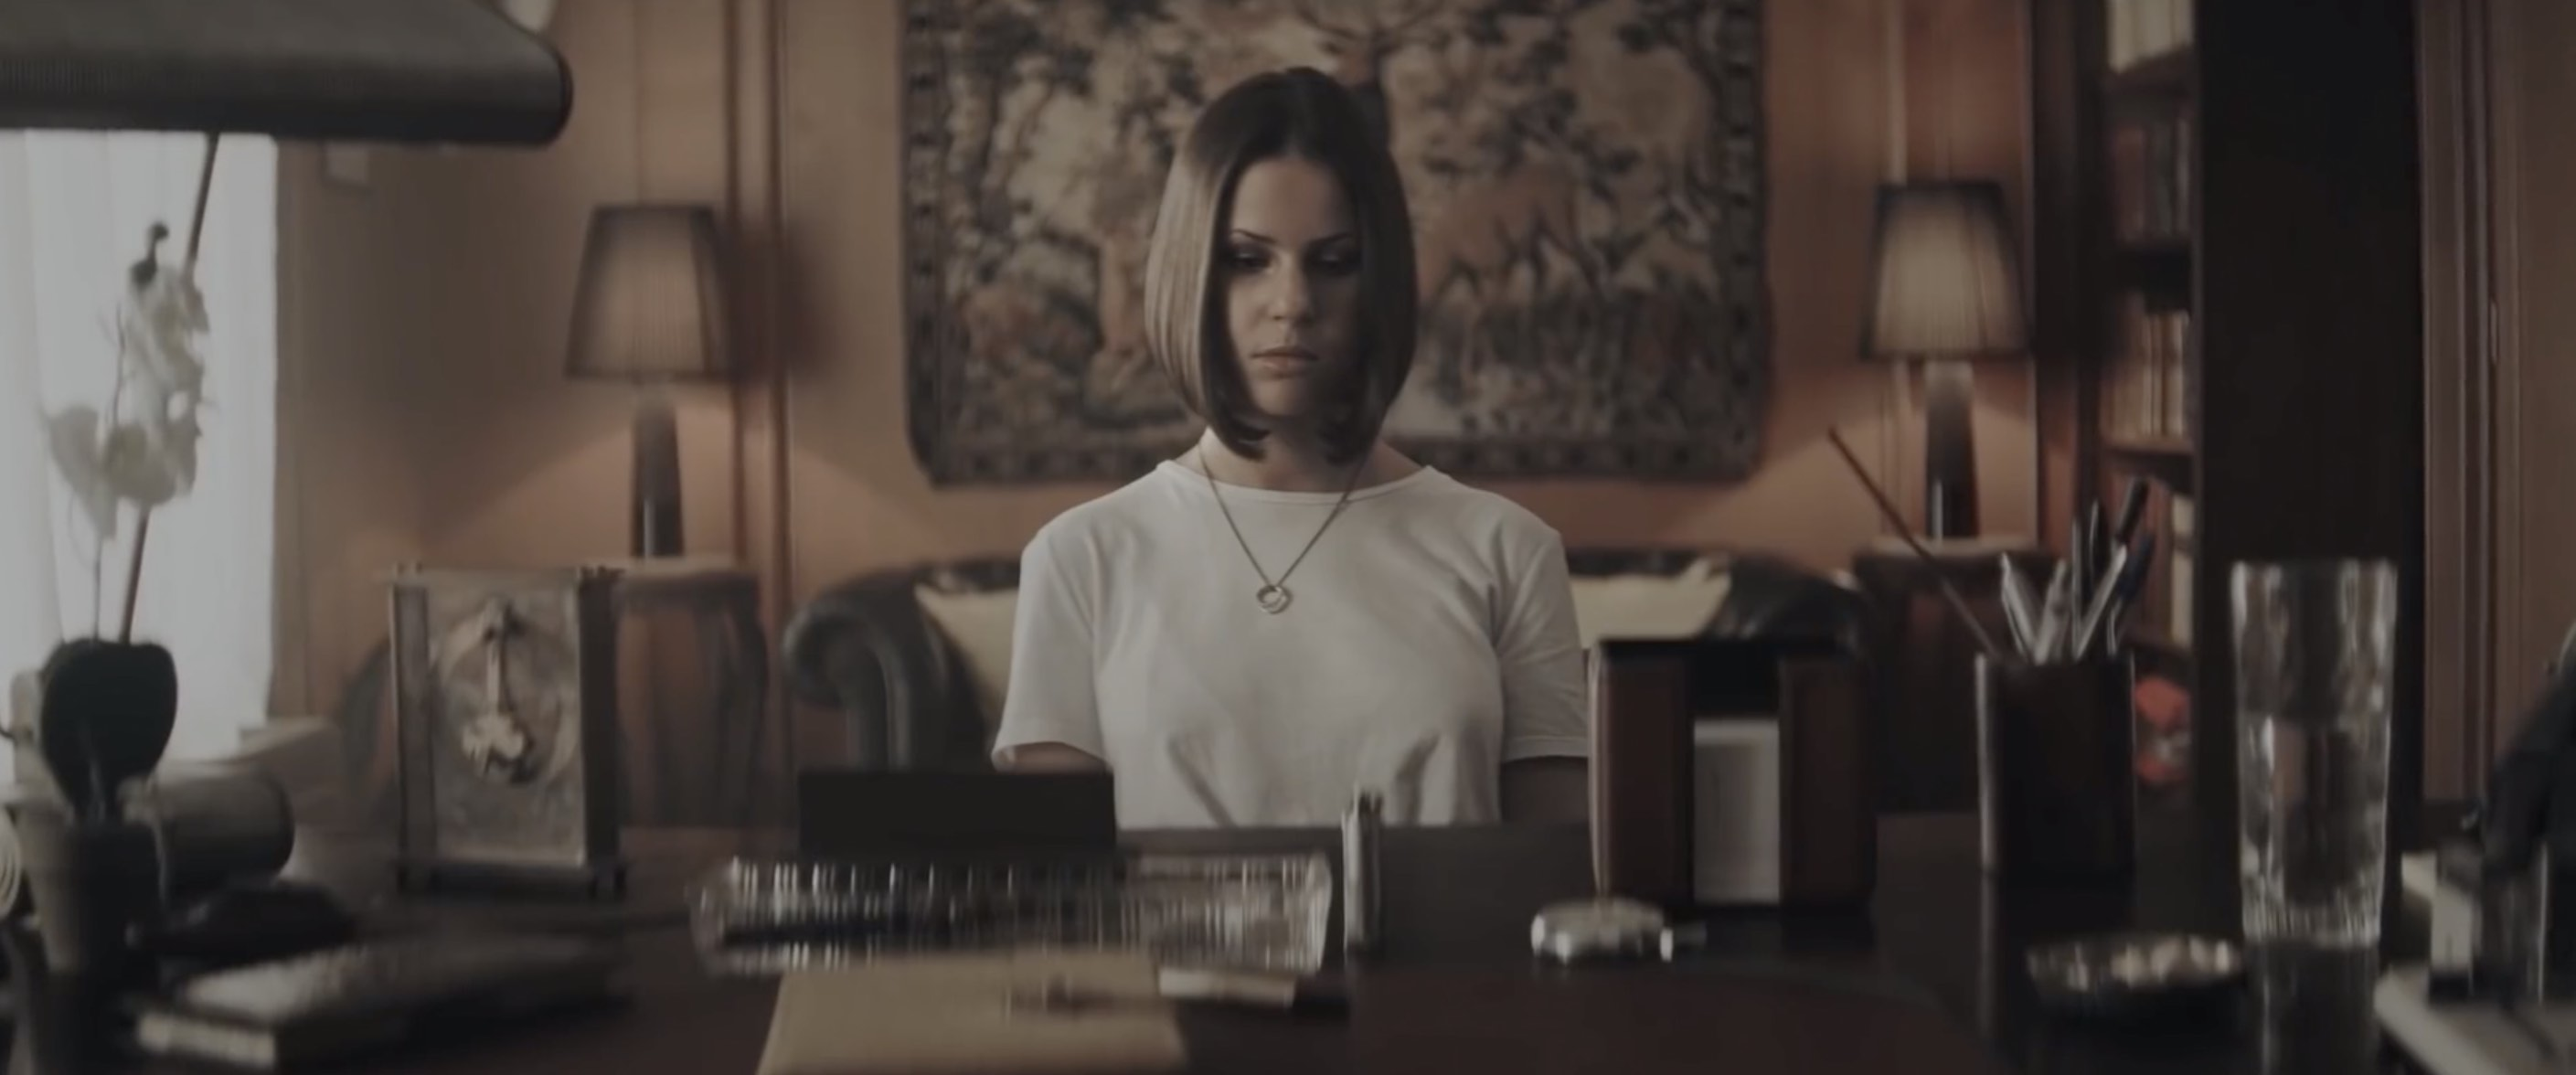 Marina Kaye - Twisted - clip